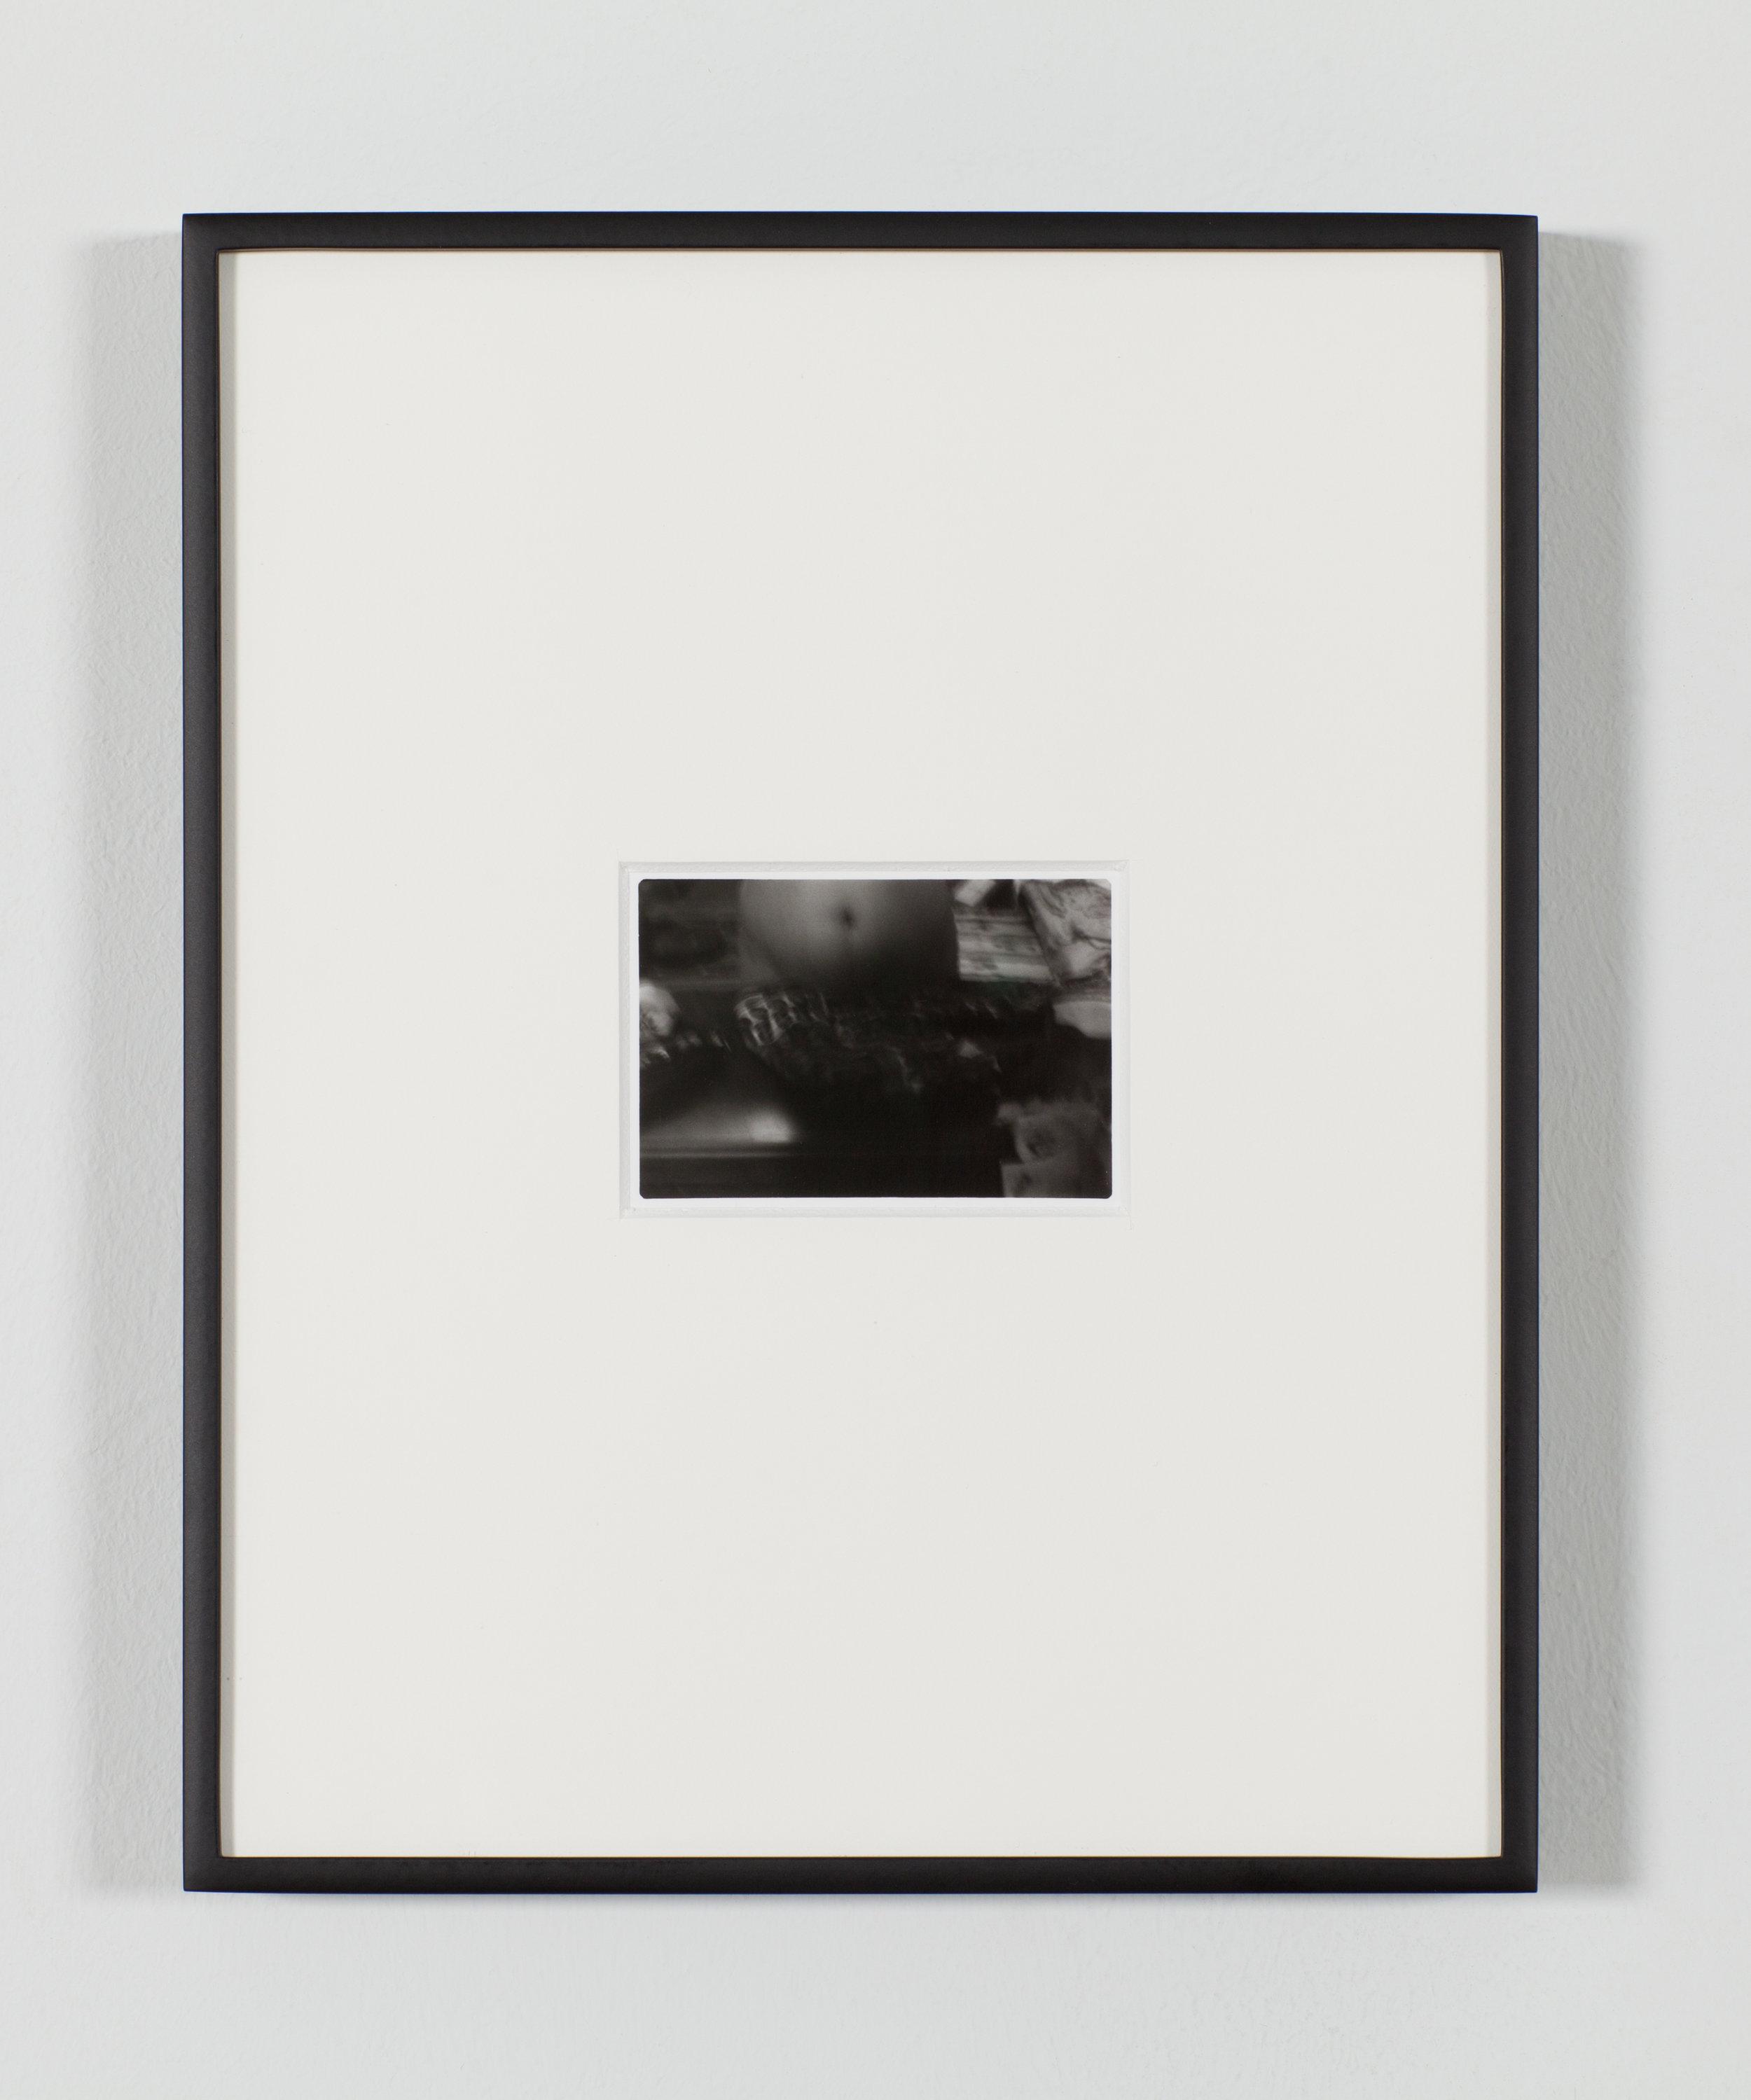 "Untitled, 2019 Gelatin Silver Print 2.7x1.8"" in 8x10"" Aluminum Frame"